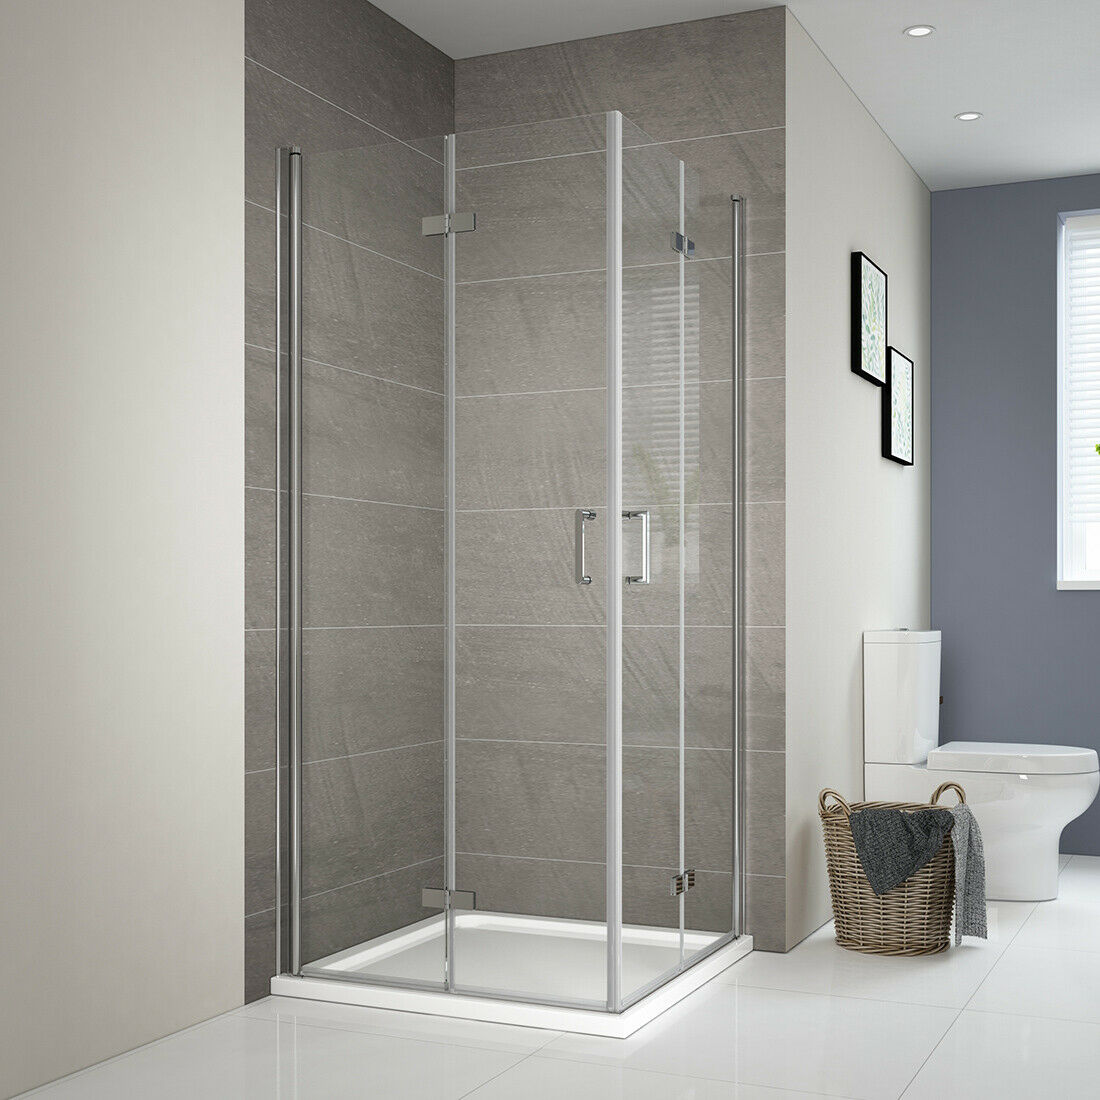 Duschwand Falttür Duschtrennwand Glas Duschabtrennung Dusche Duschkabine 185cm